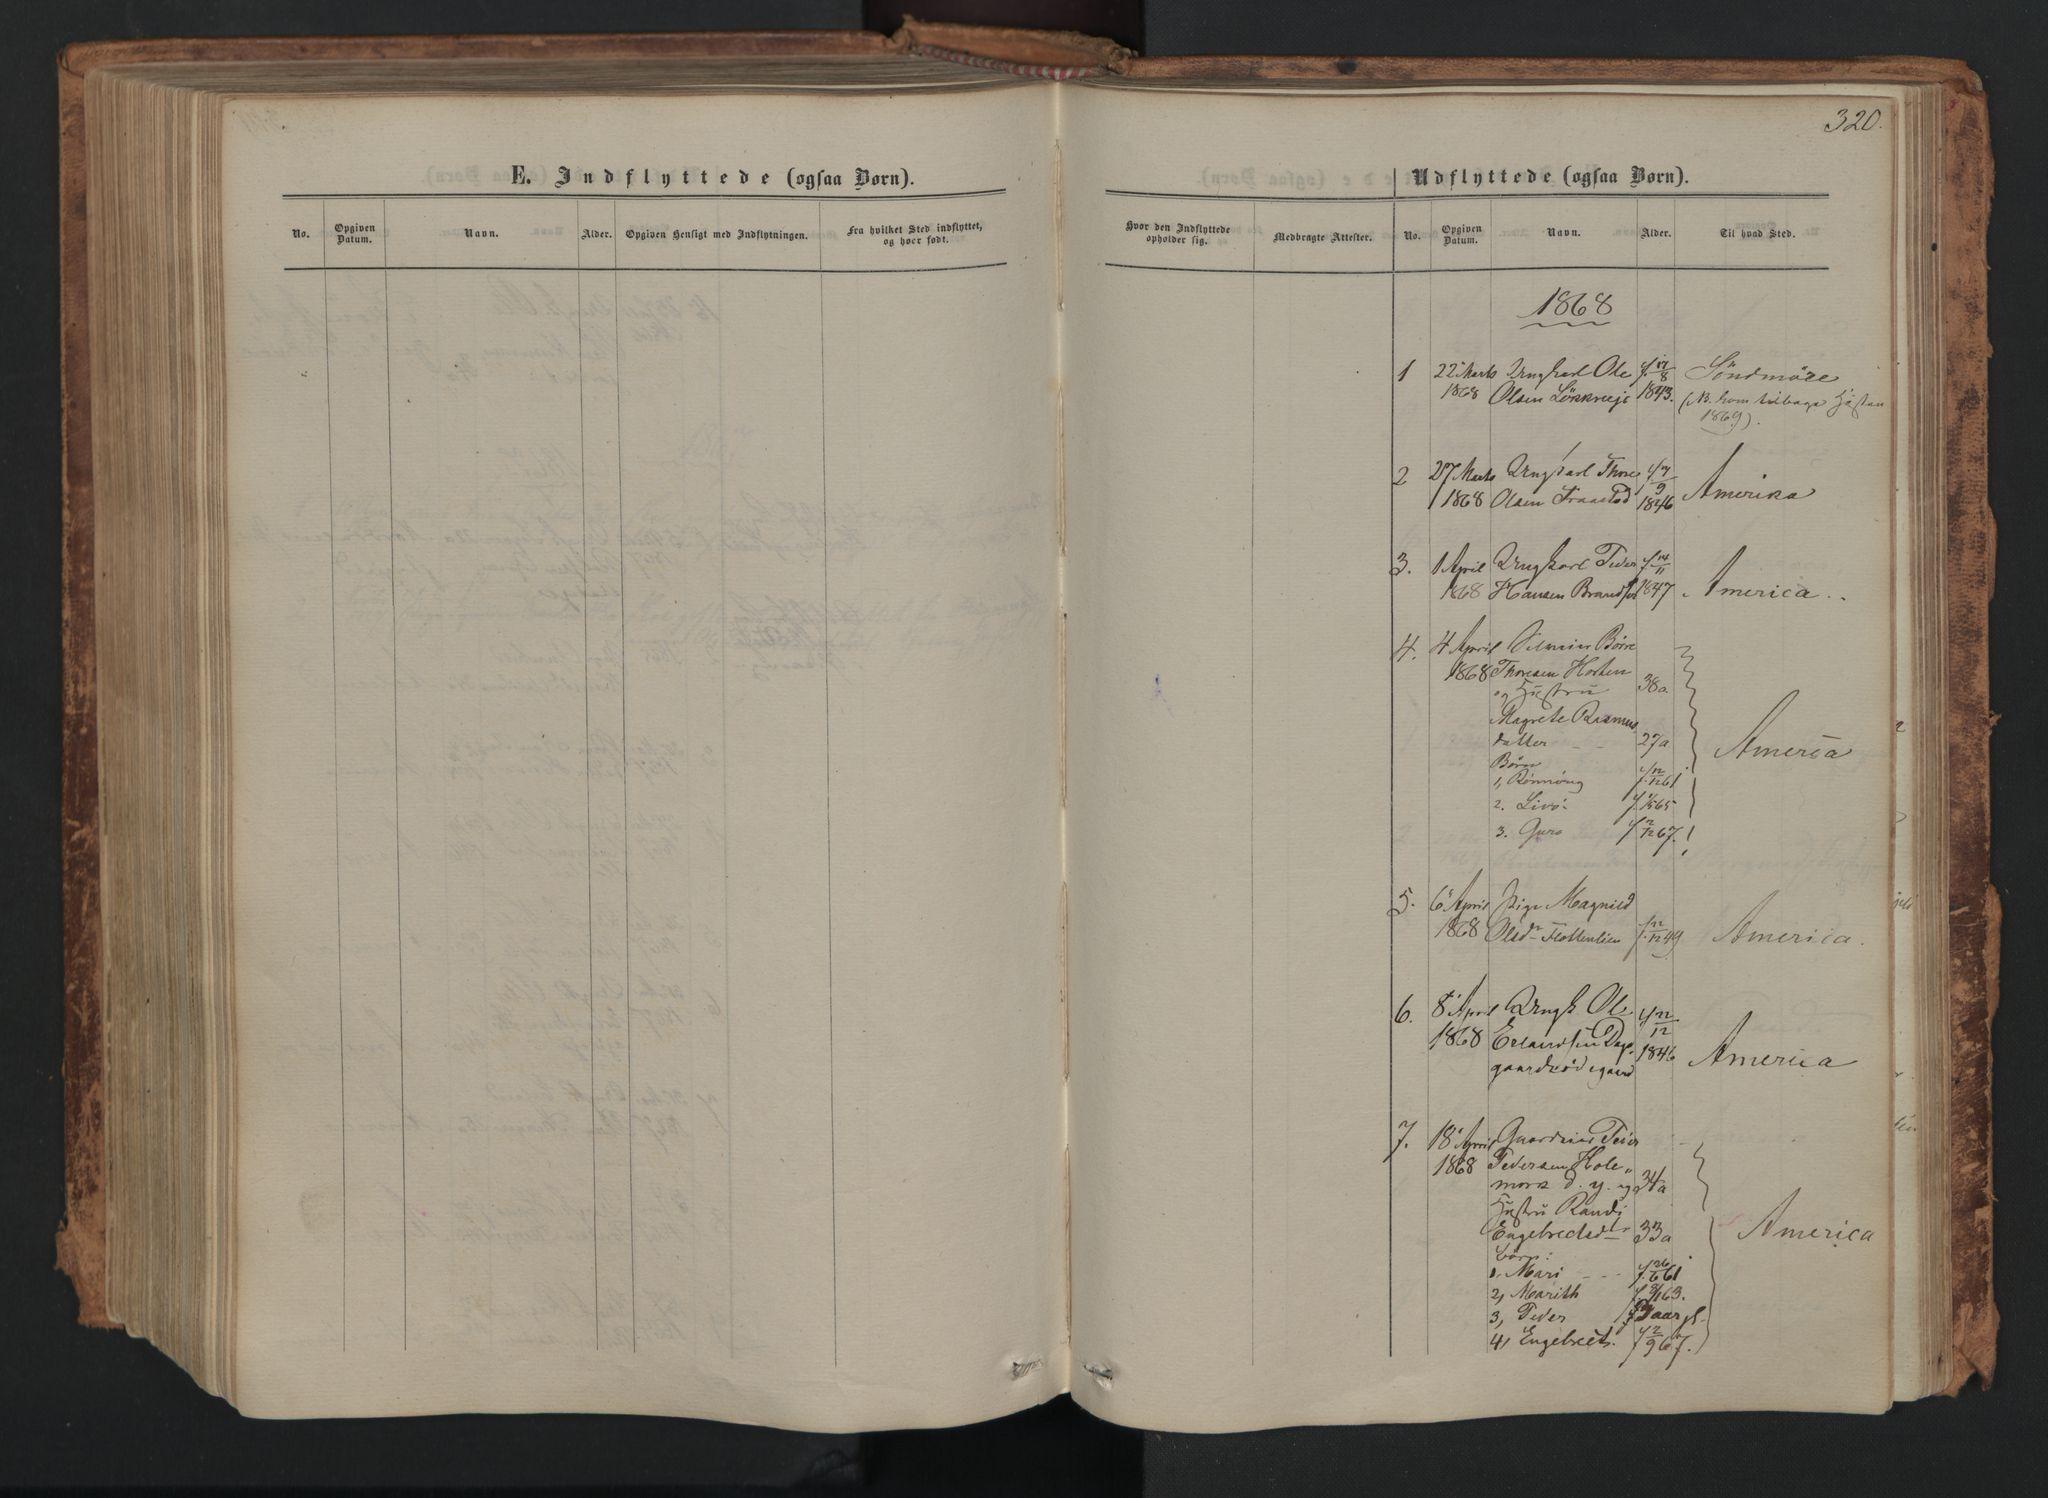 SAH, Skjåk prestekontor, Ministerialbok nr. 1, 1863-1879, s. 320